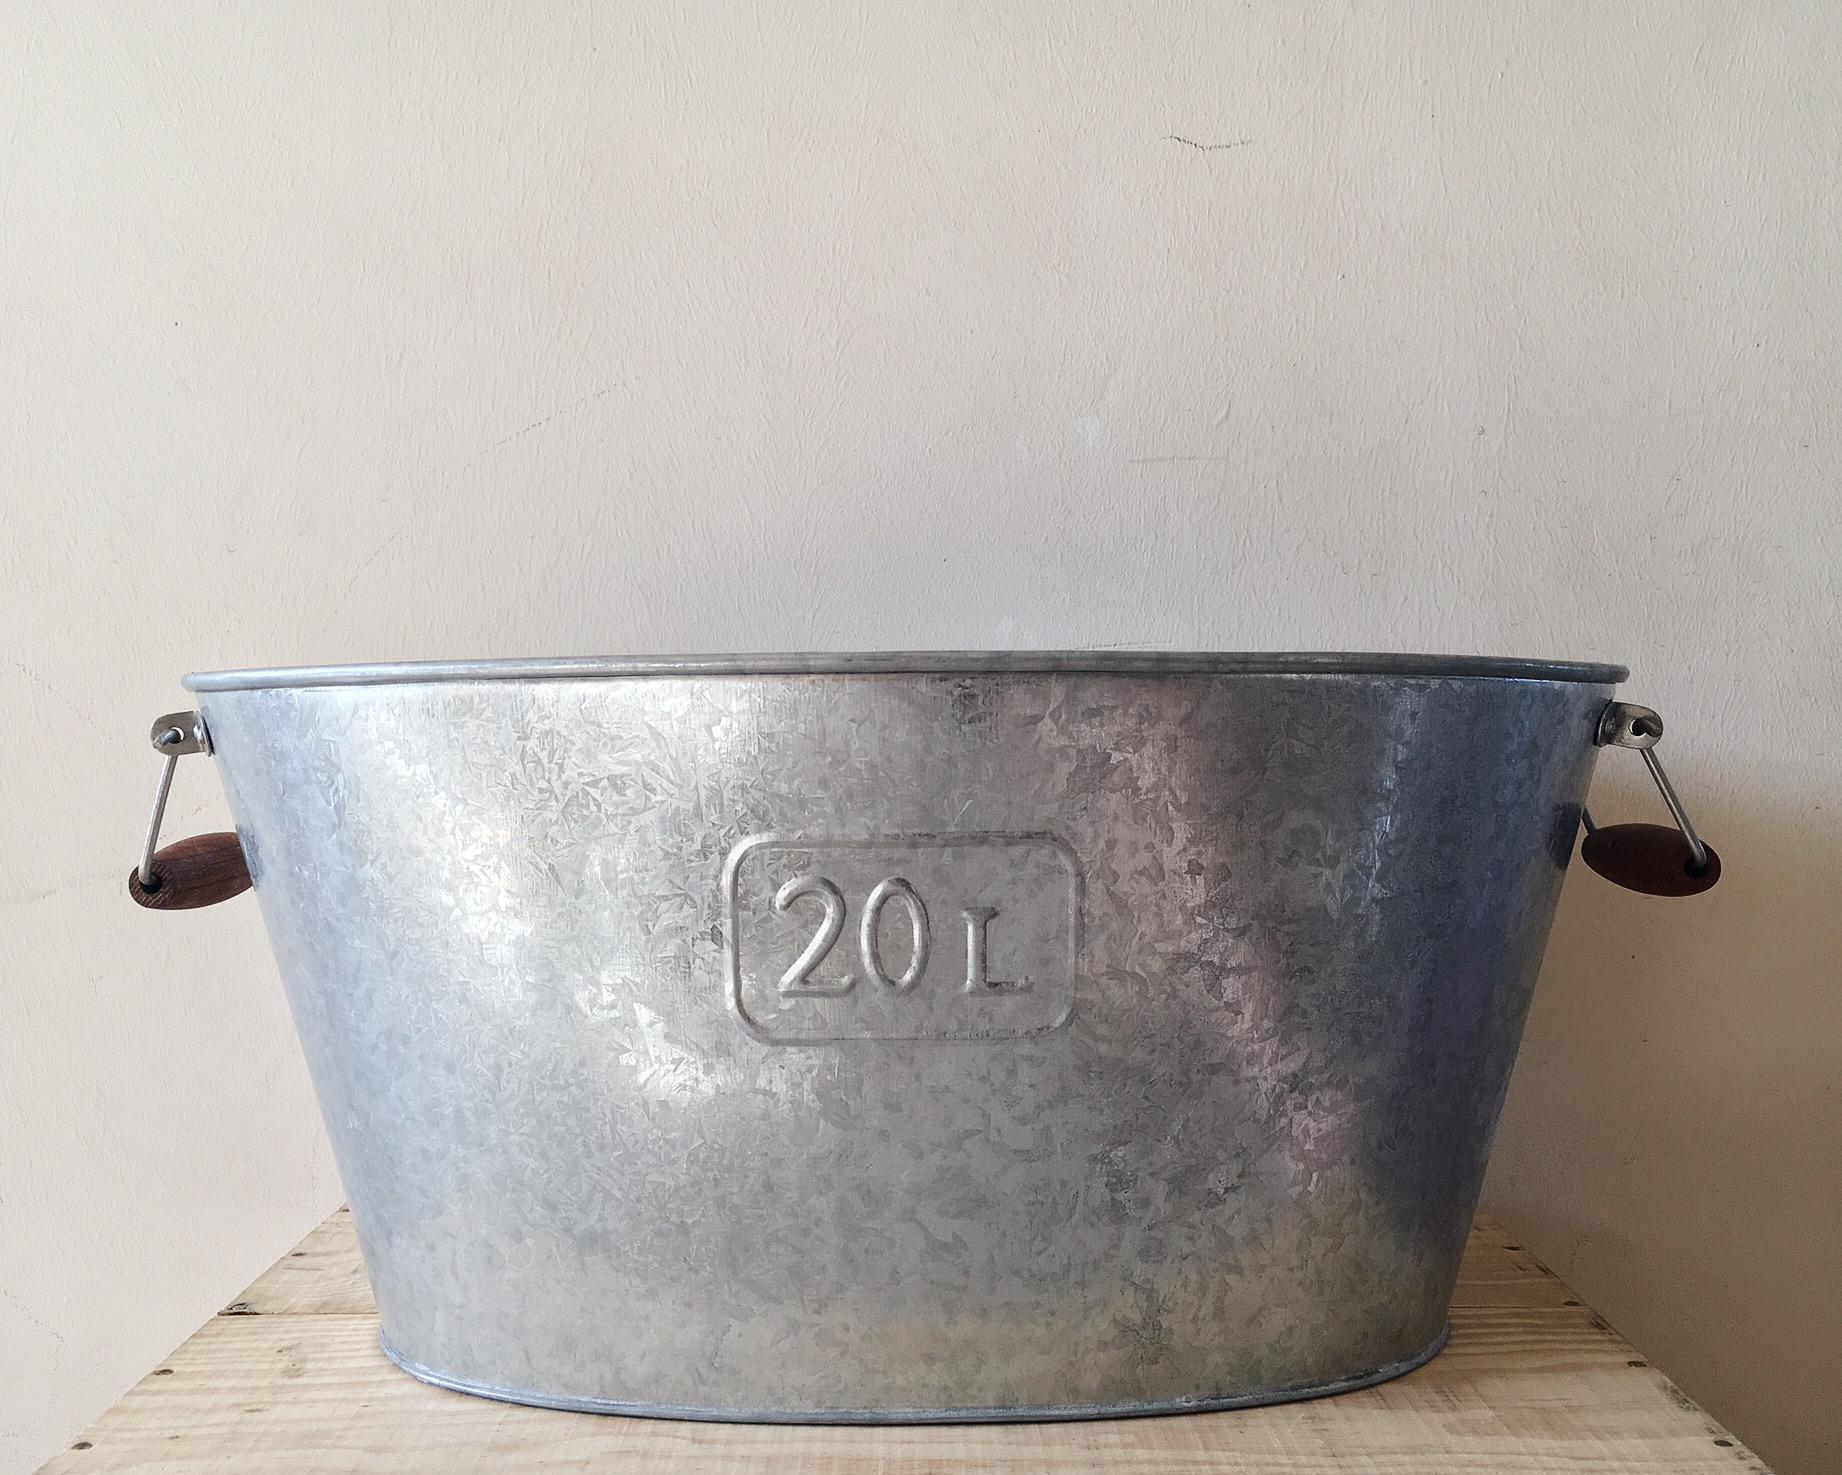 DT11 Galavanized Tub